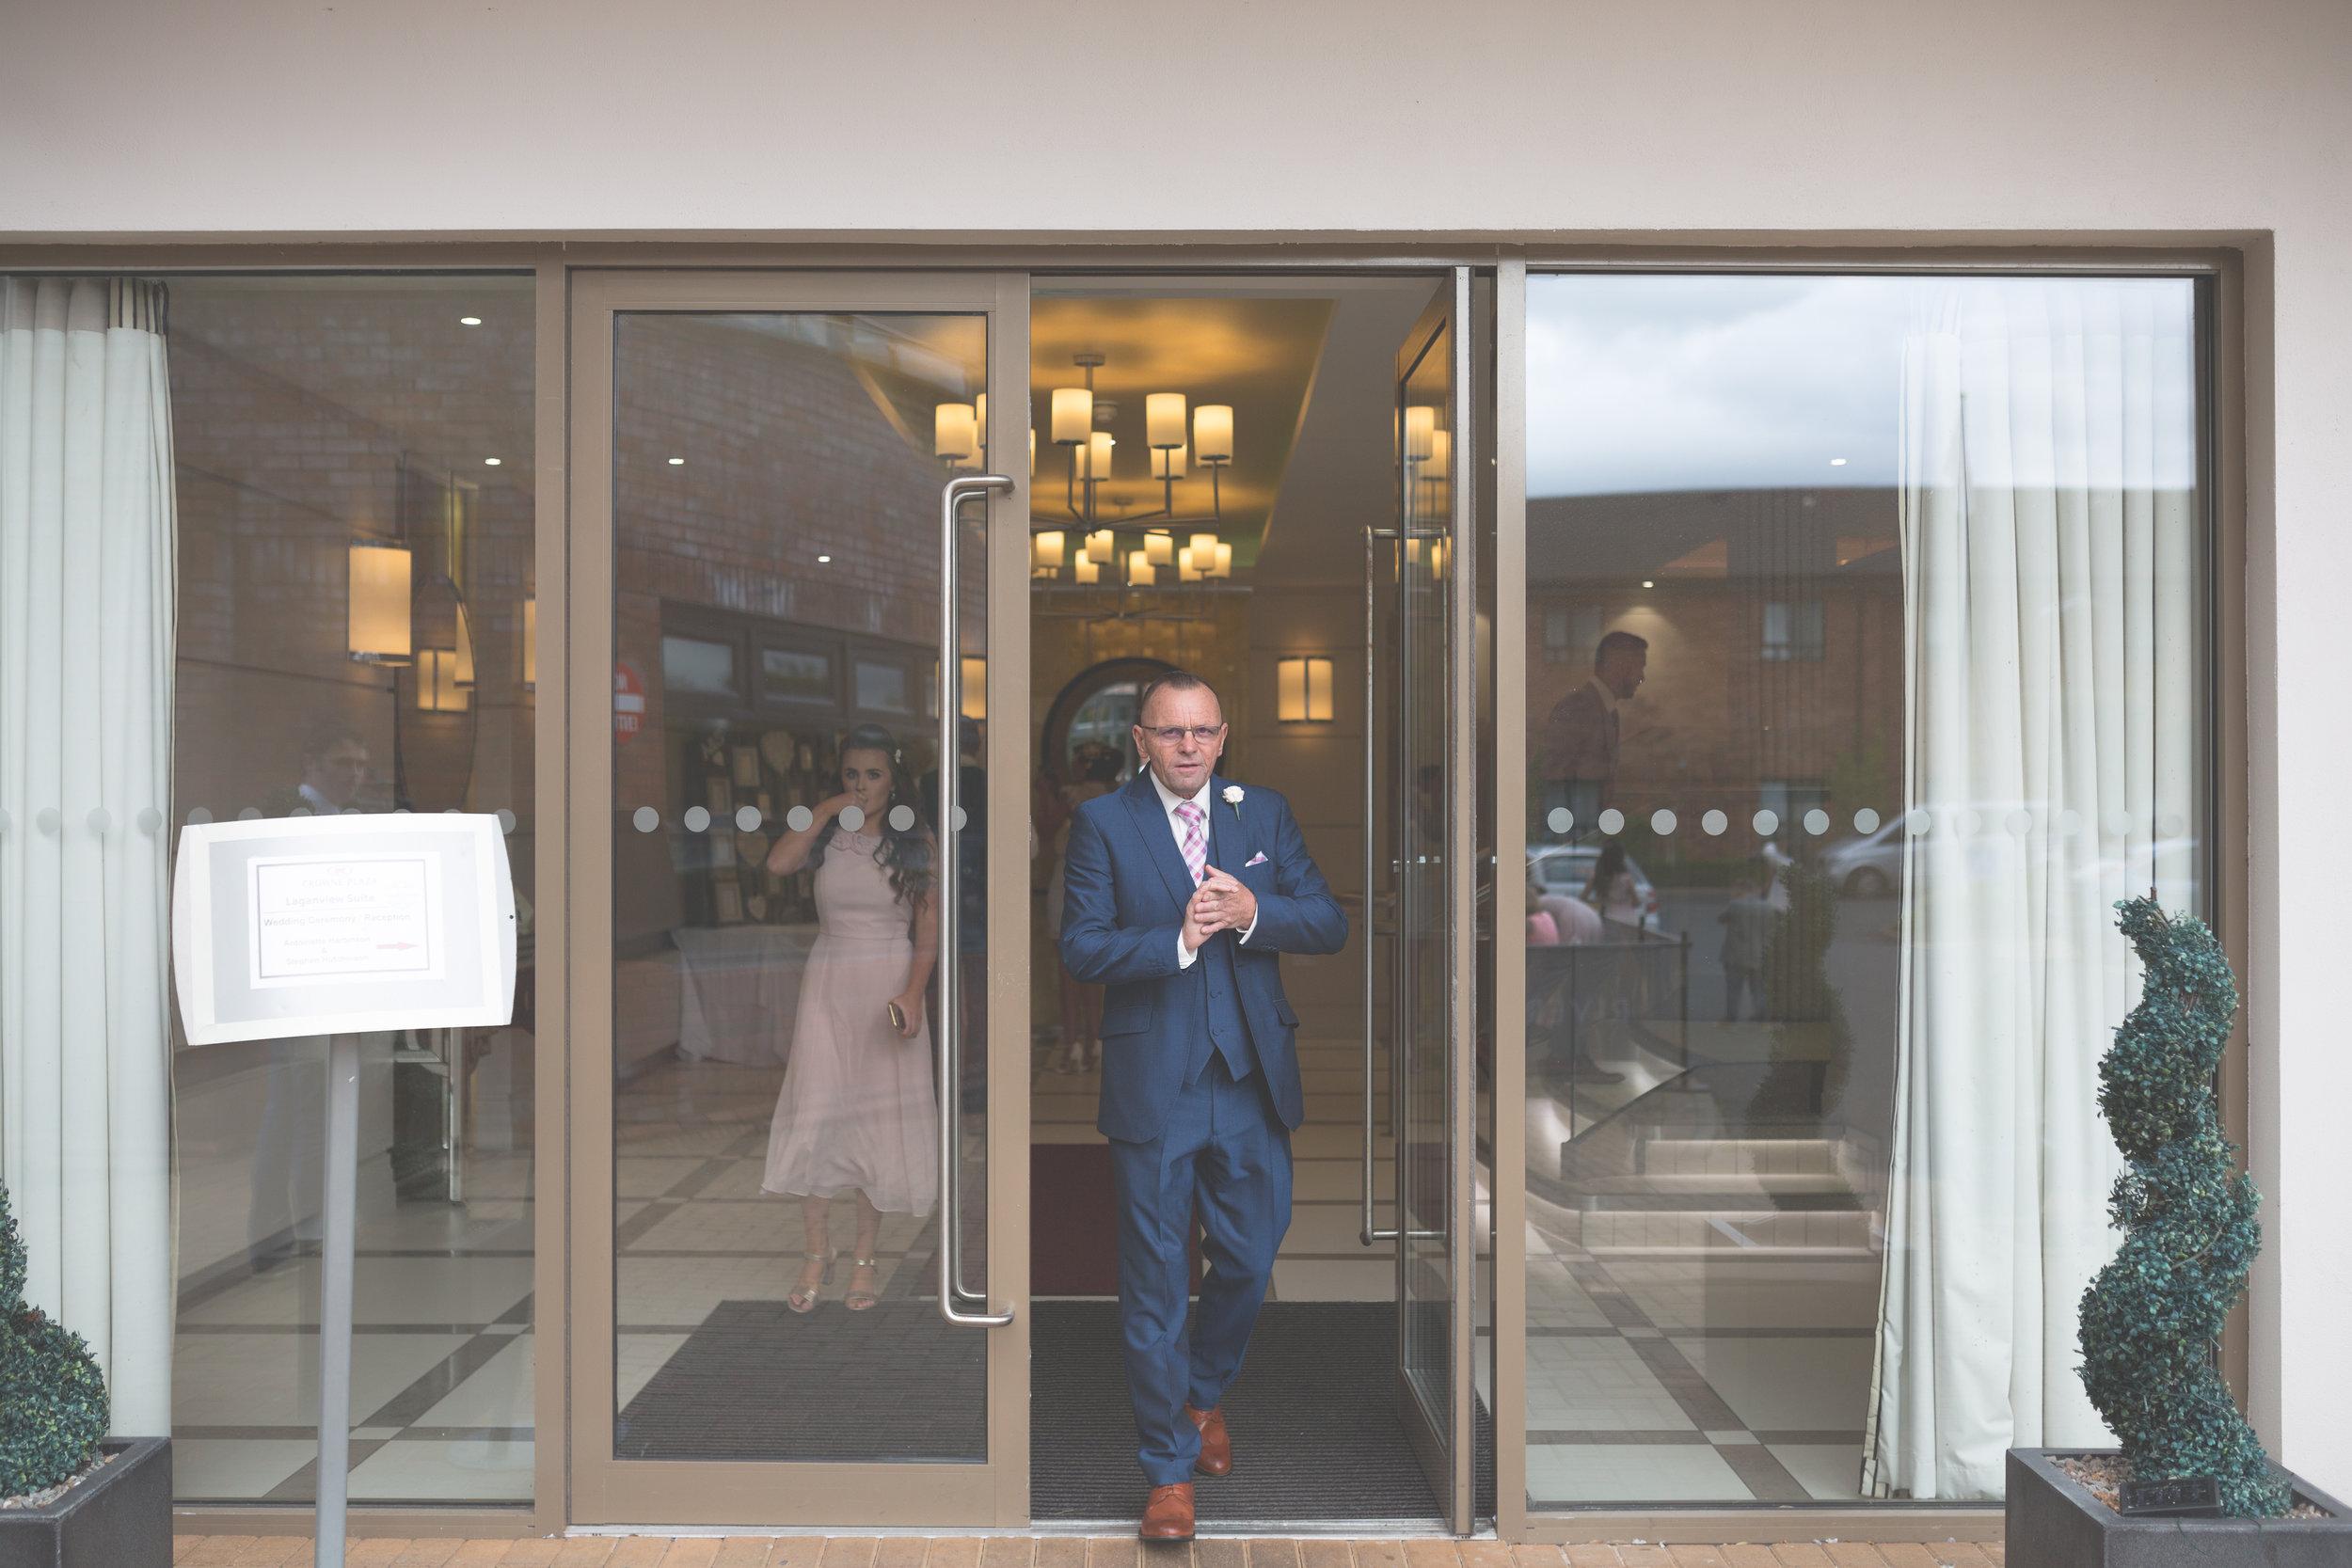 Antoinette & Stephen - Portraits | Brian McEwan Photography | Wedding Photographer Northern Ireland 40.jpg